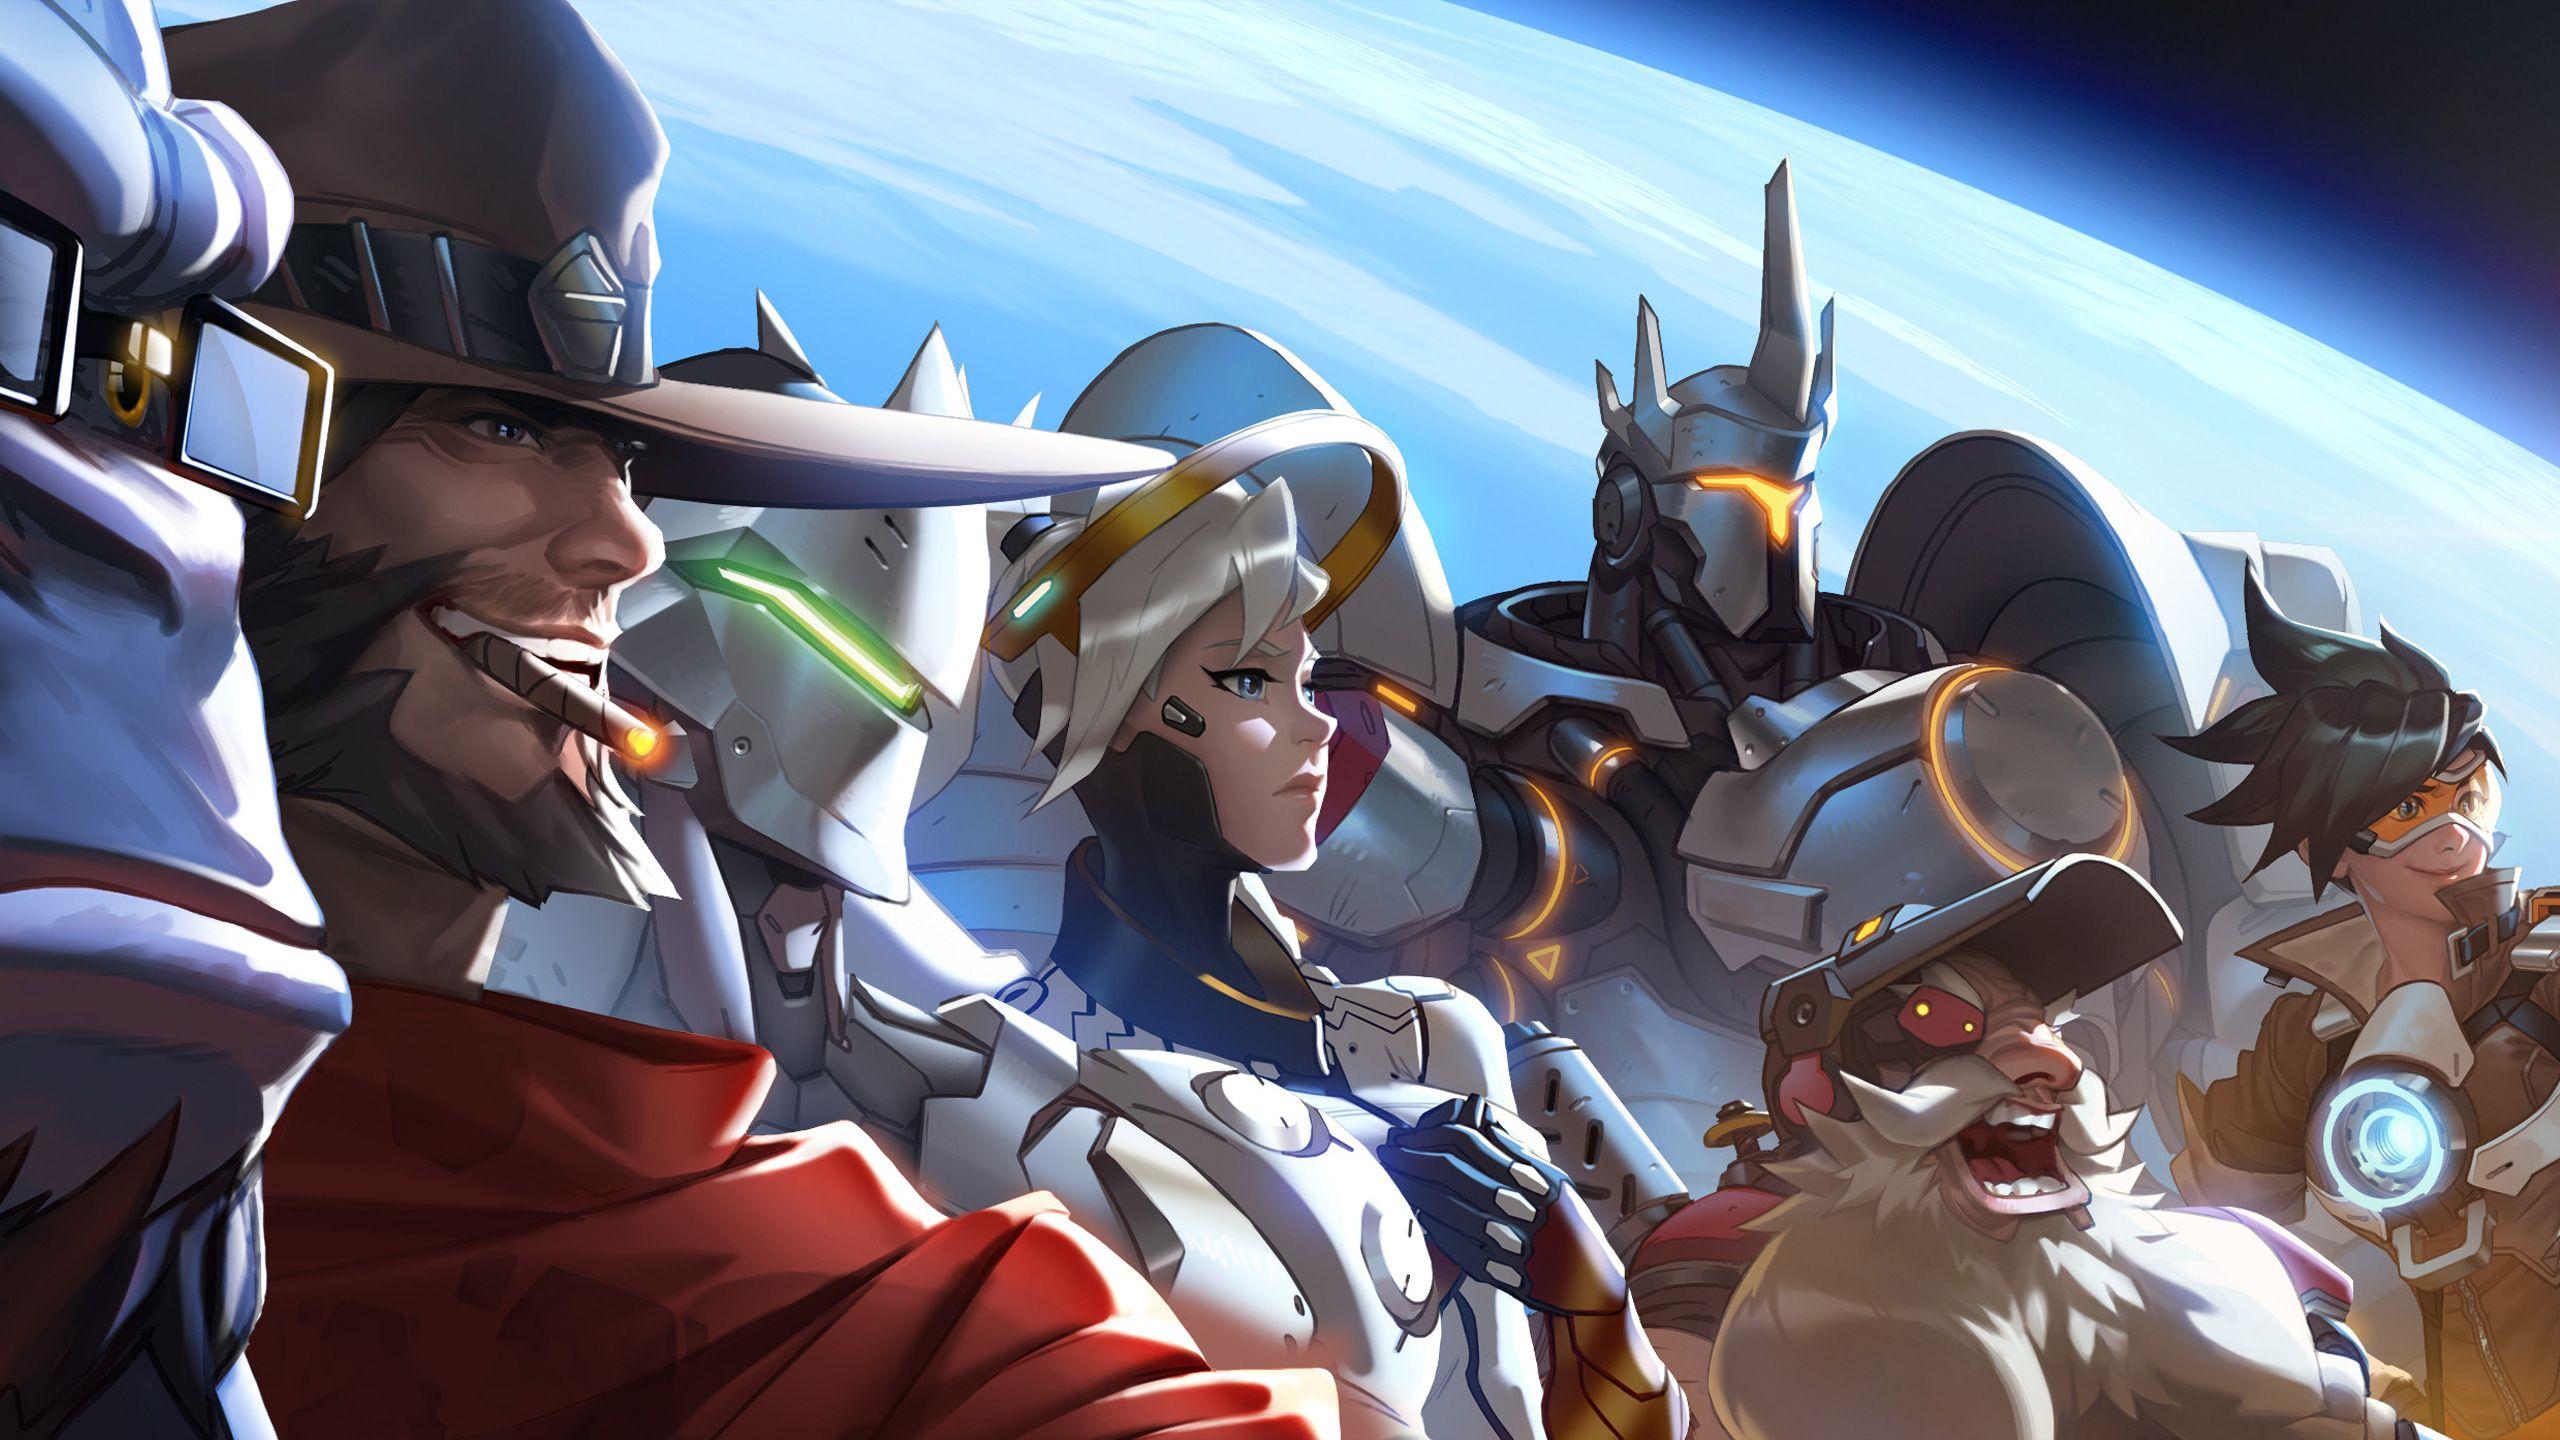 Overwatch Game Wallpaper Characters 2560x1440 overwatch